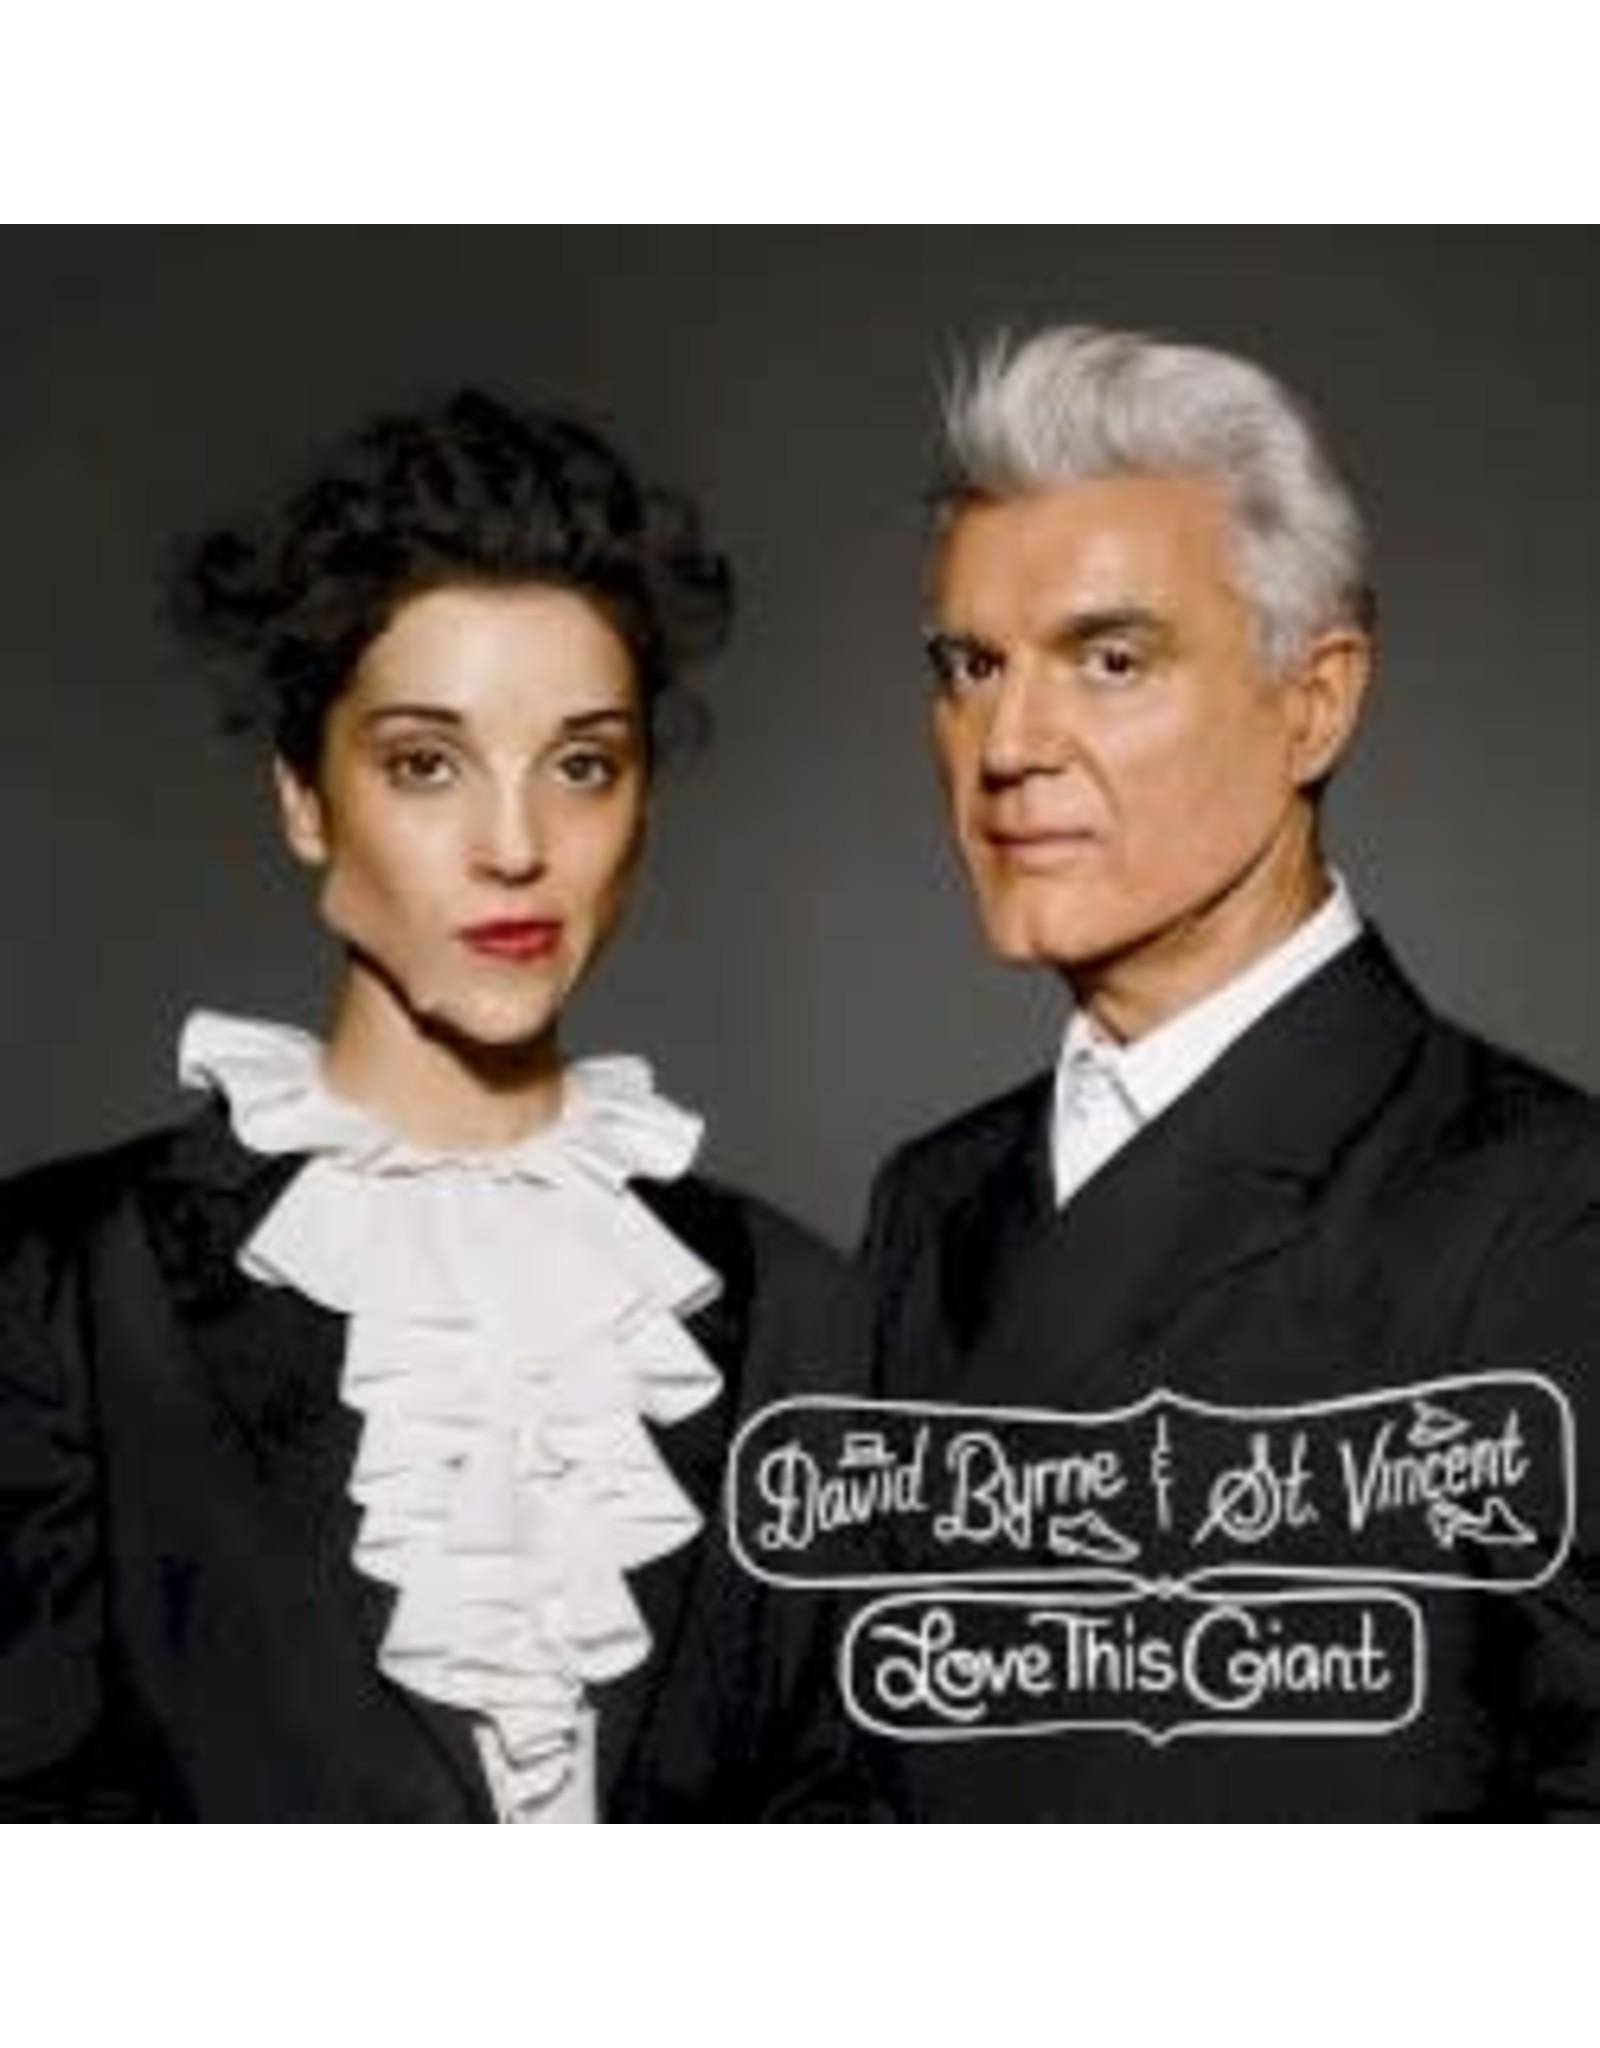 Byrne, David & St Vincent - Love This Giant LP